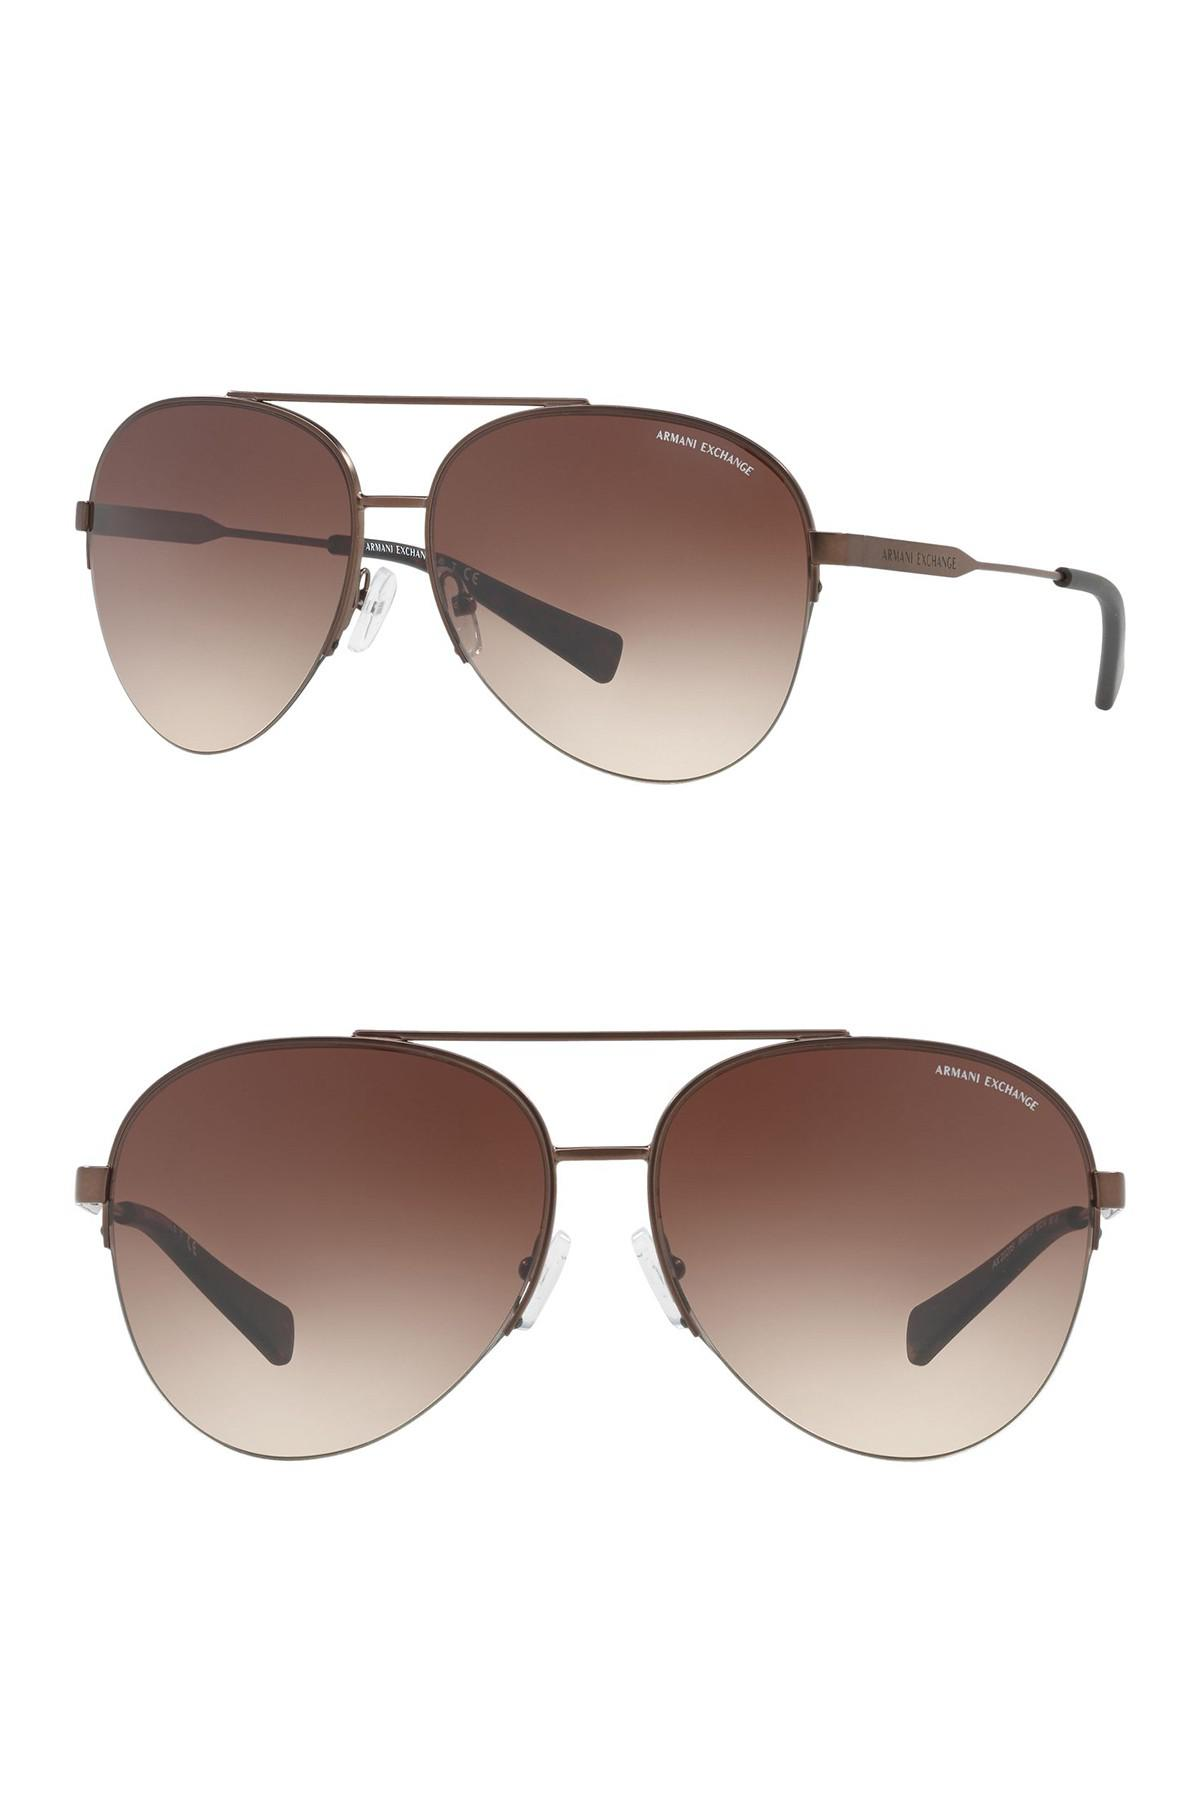 4fdc908cb3c Lyst - Armani Exchange Pilot 60mm Aviator Sunglasses in Brown for Men